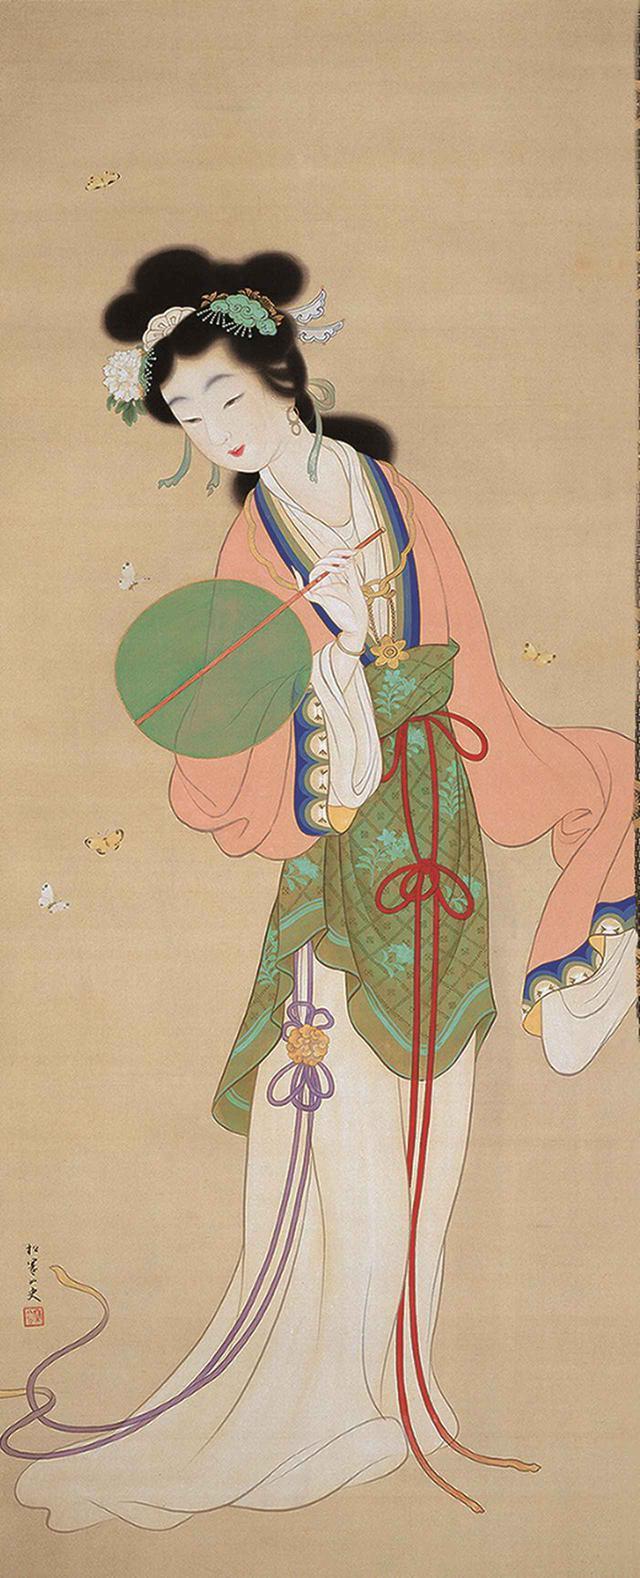 画像: 上村松園「楚蓮香之図」大正13年頃  後期展示・11月26日から